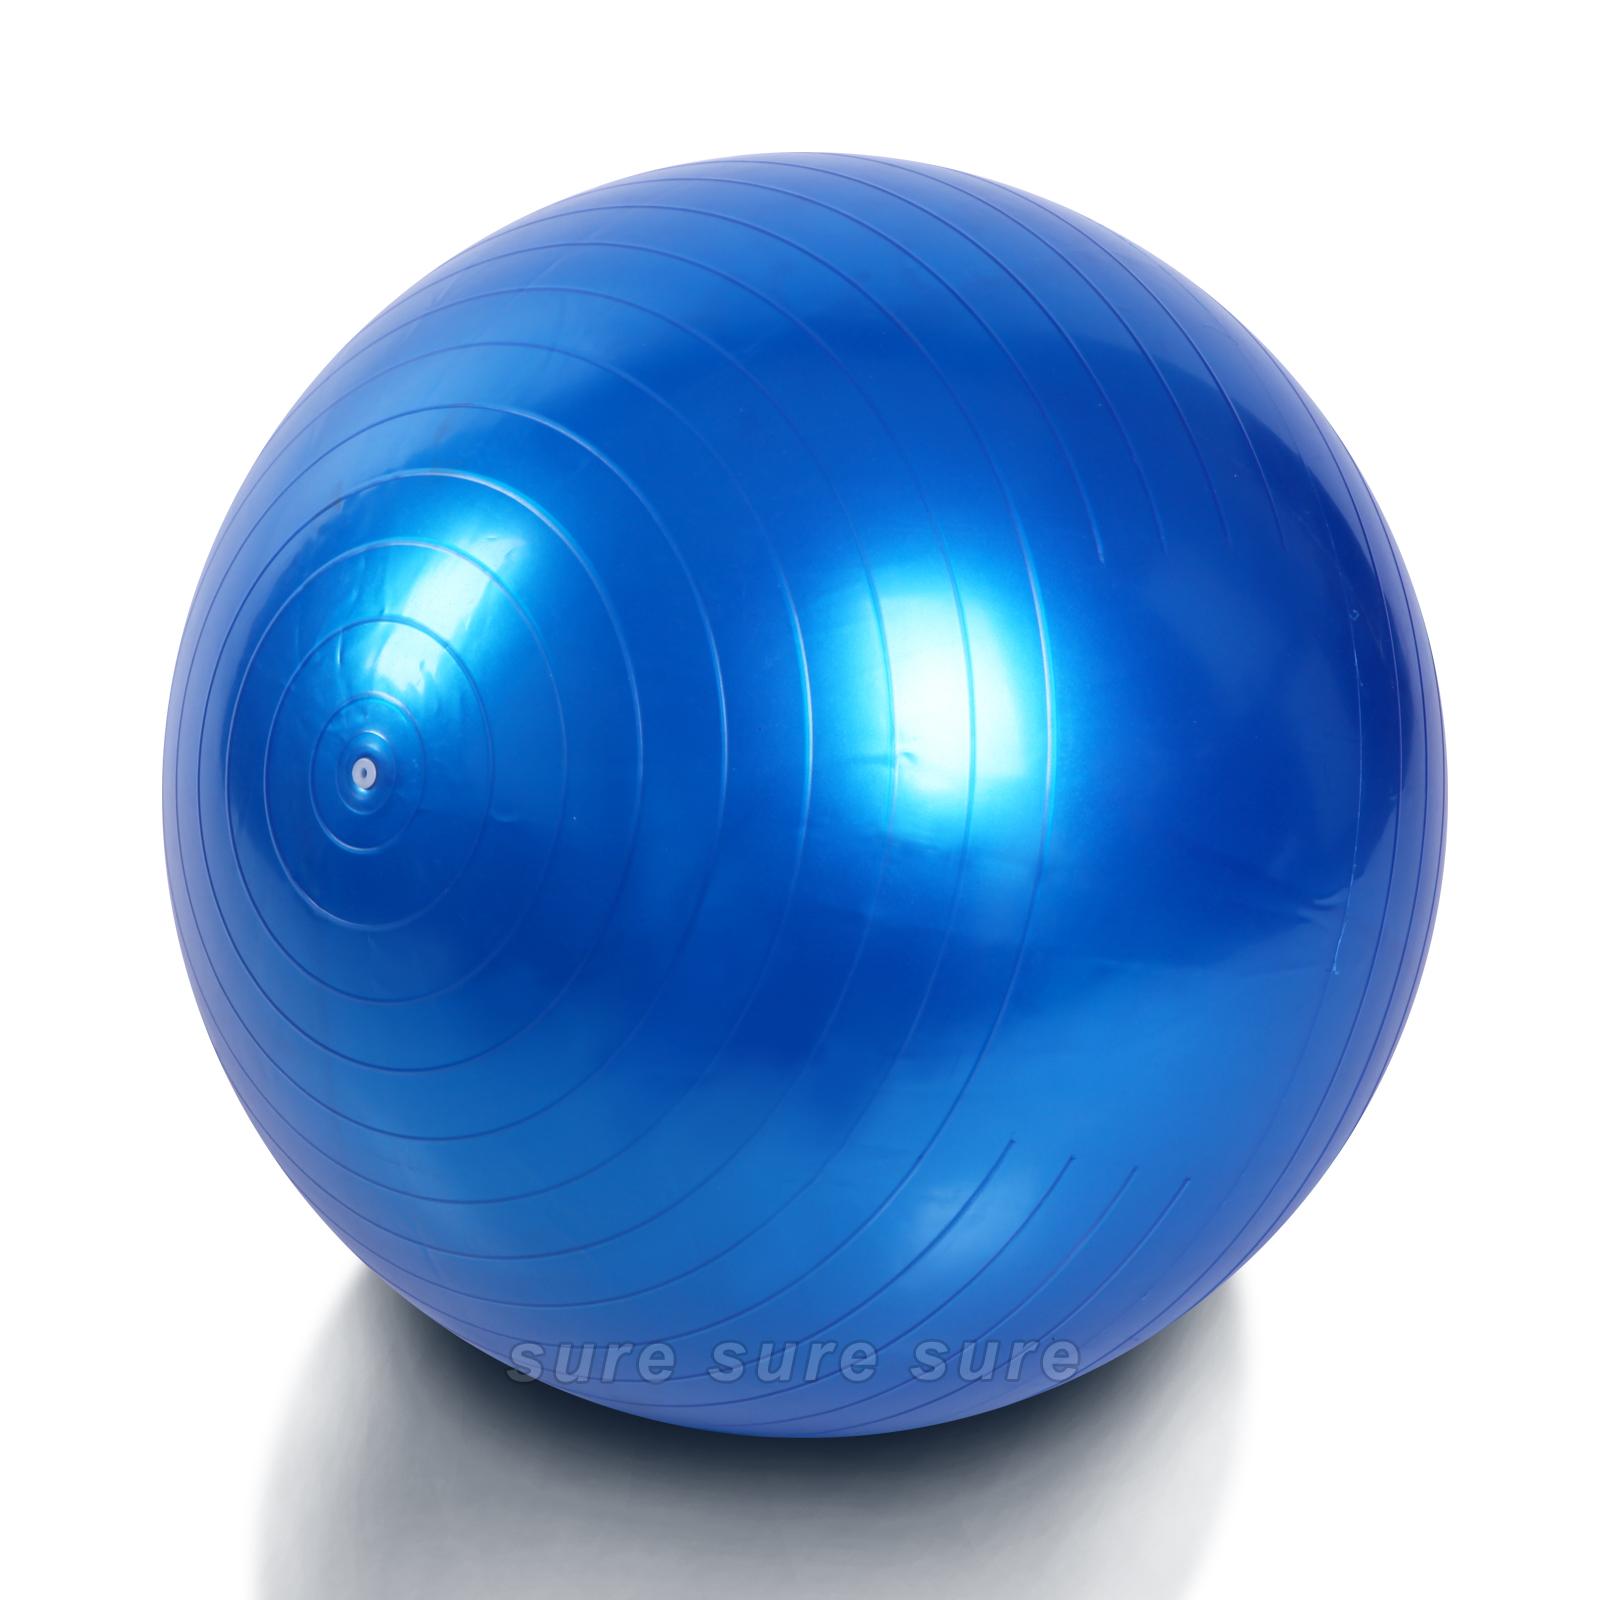 Balance Ball Exercises For Pregnancy: Aerobic Ball Yoga Ball For GYM Yoga Pilates Pregnancy